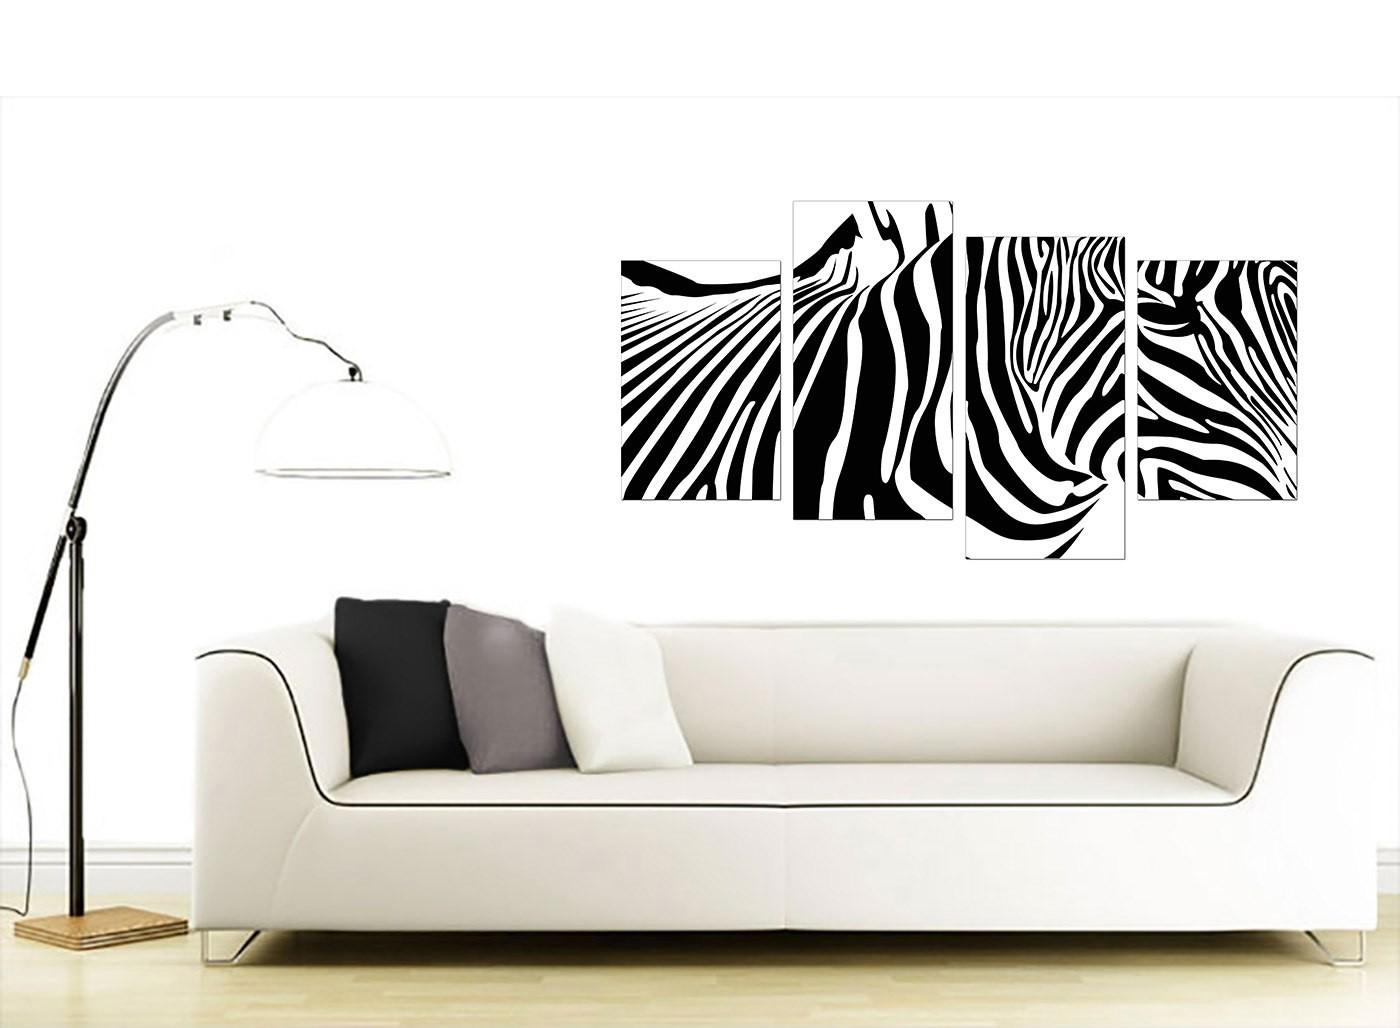 Animal Canvas Wall Art of Zebra - For Living Room